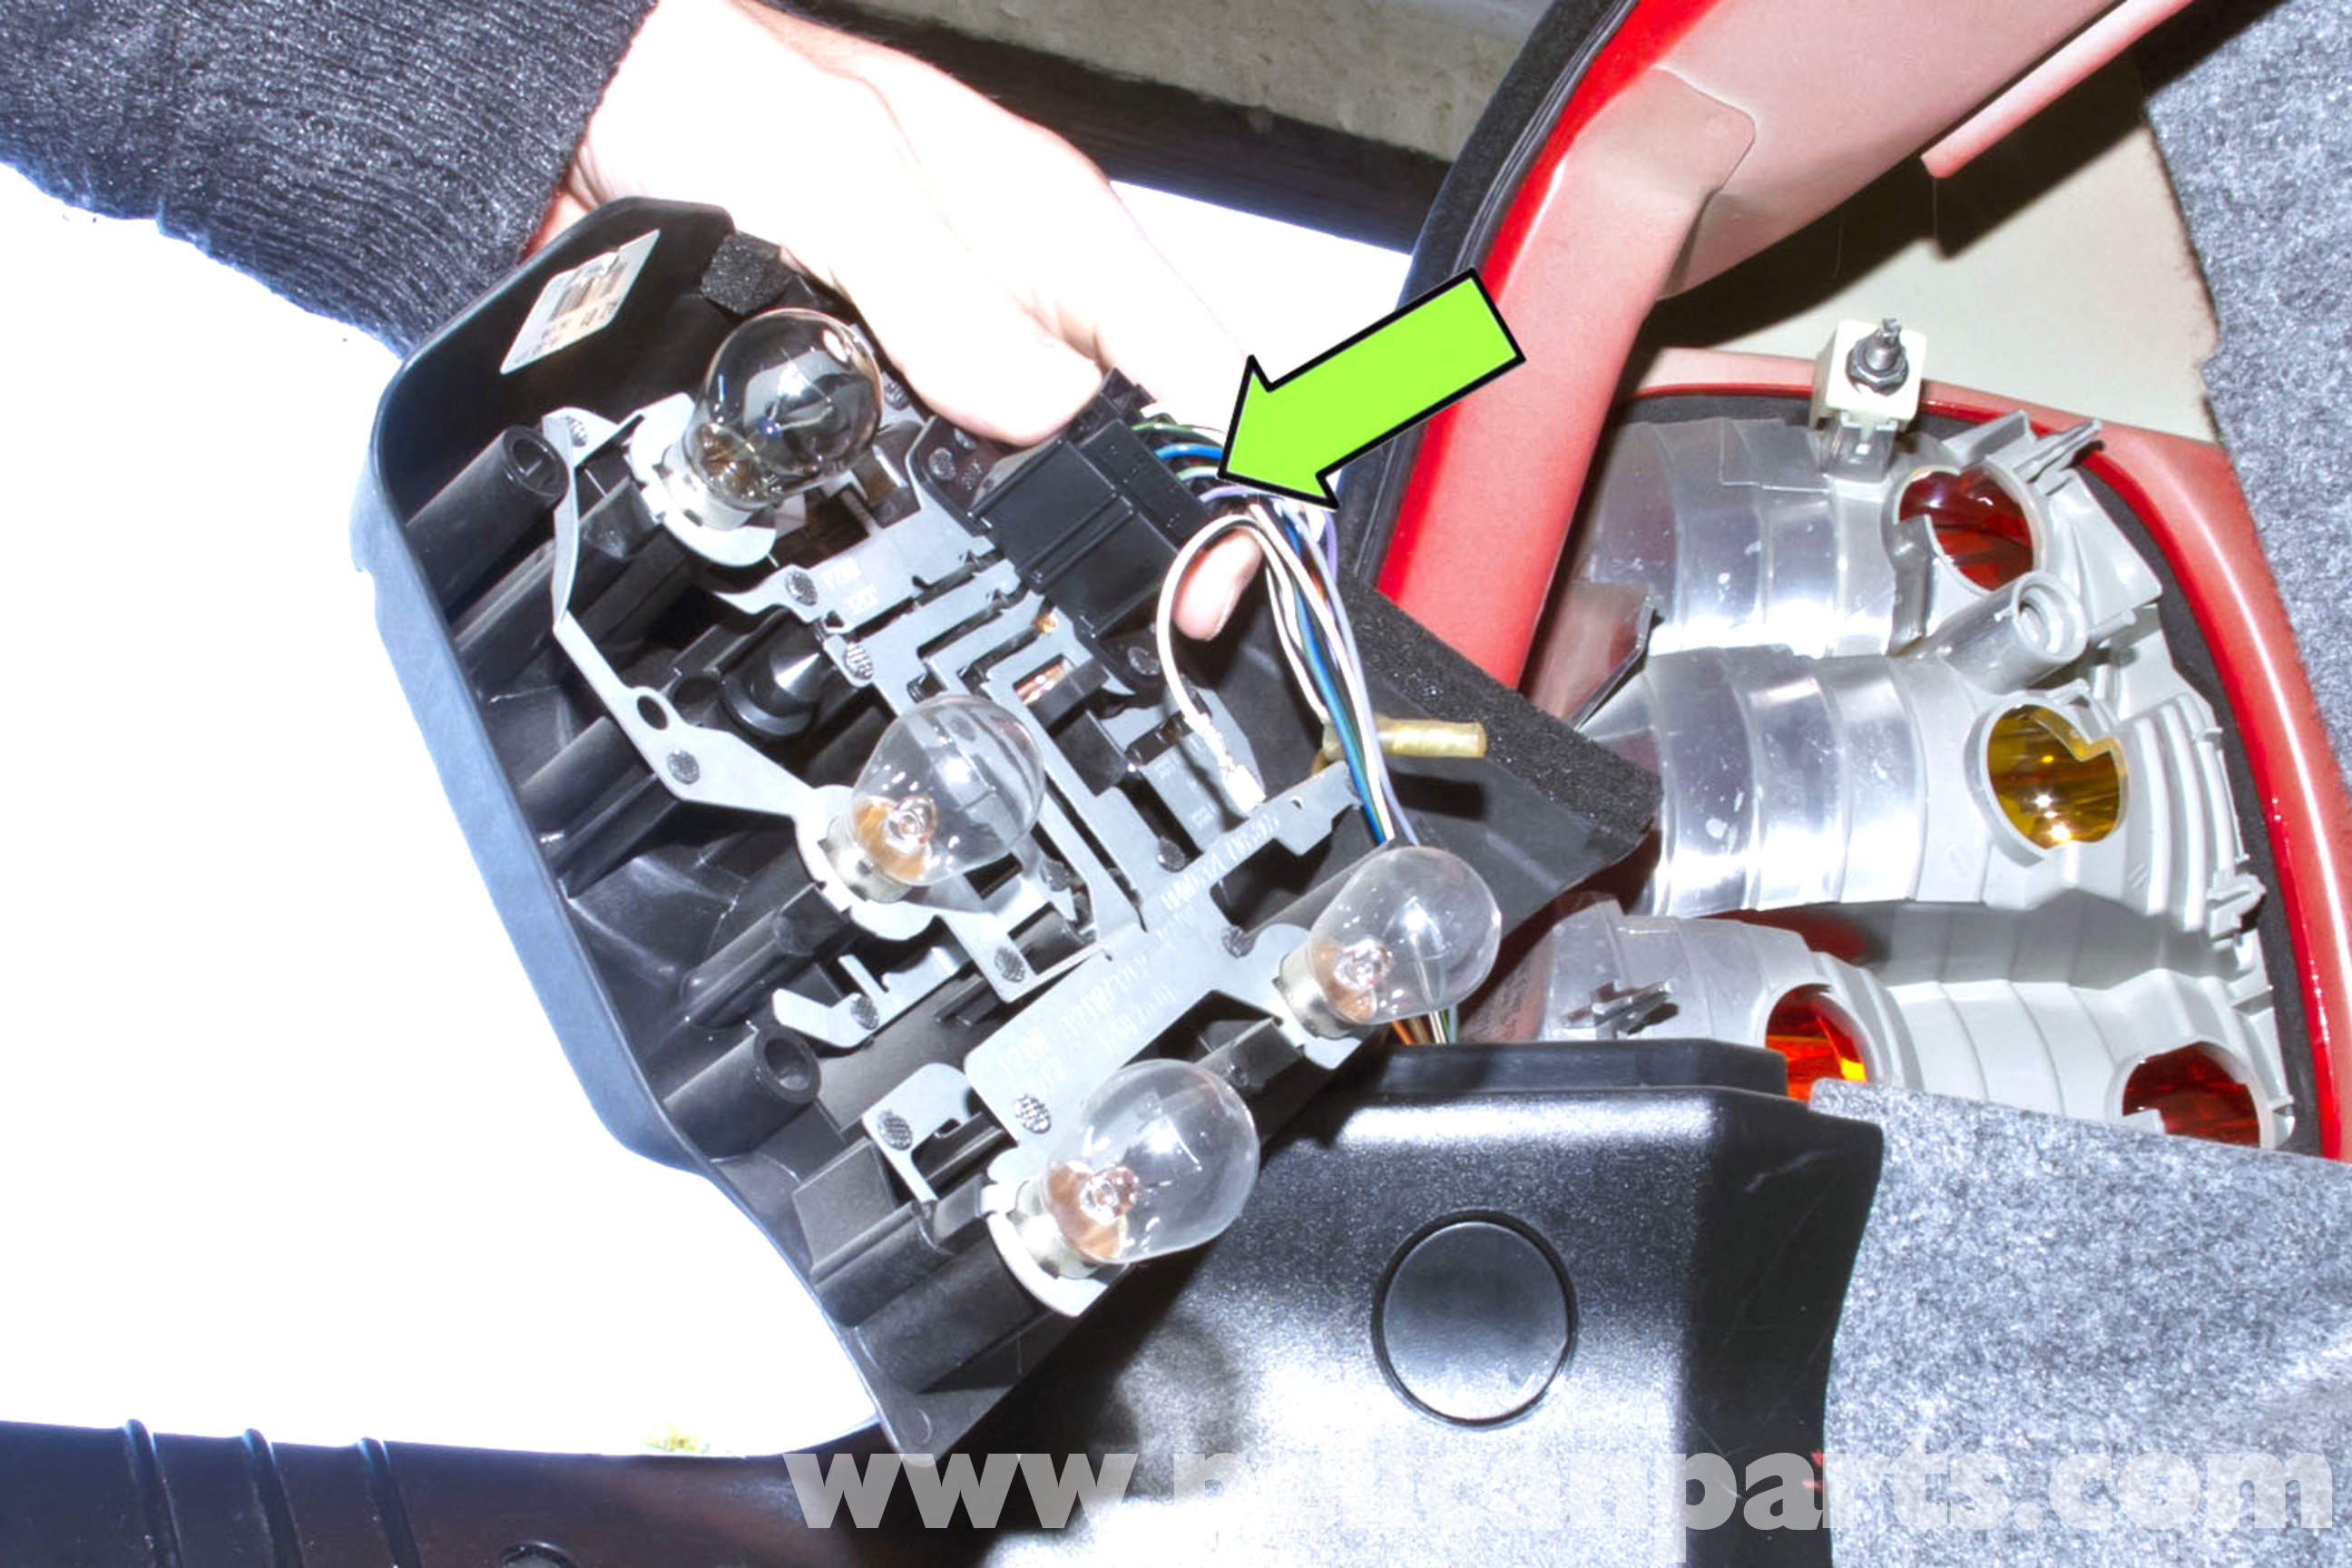 e46 wiring diagram rj45 to rj12 bmw rear tail light replacement   325i (2001-2005), 325xi 325ci ...